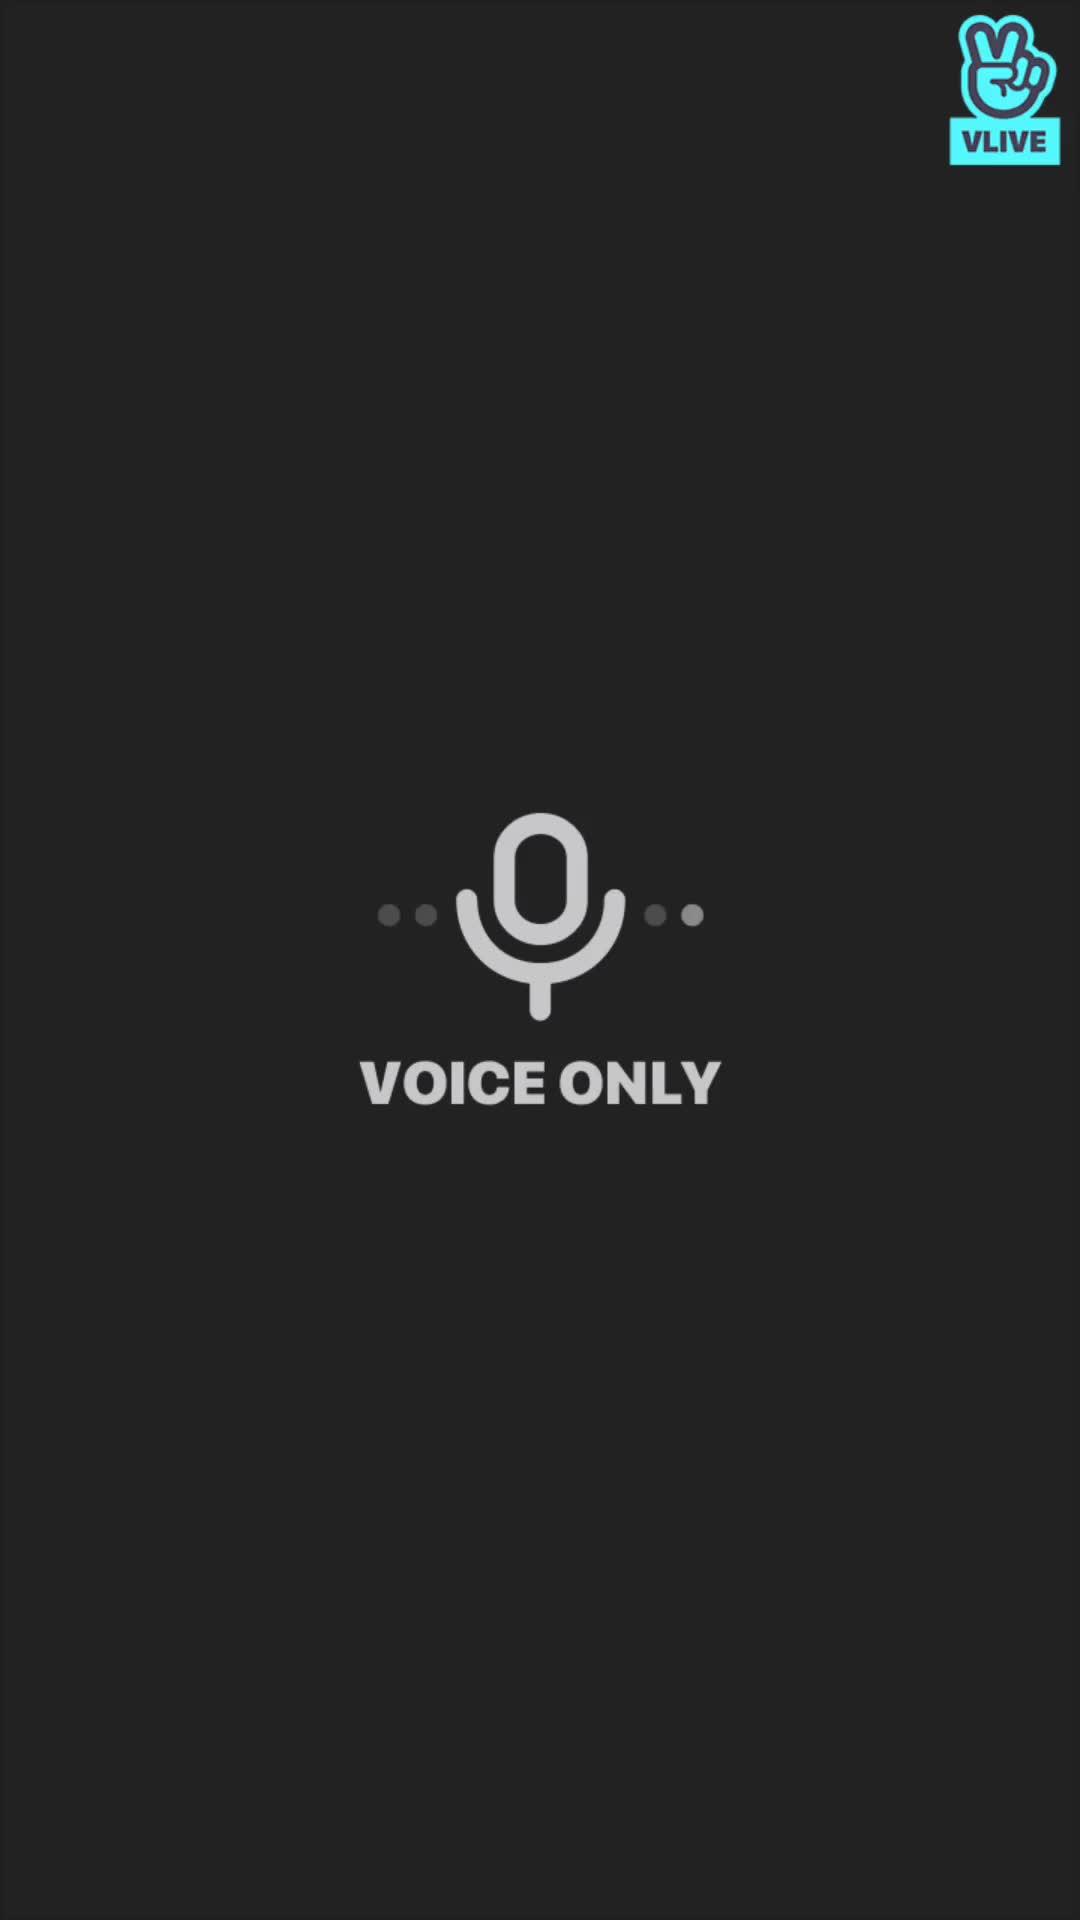 [RADIO] 캐럿들 귀대귀대 #71